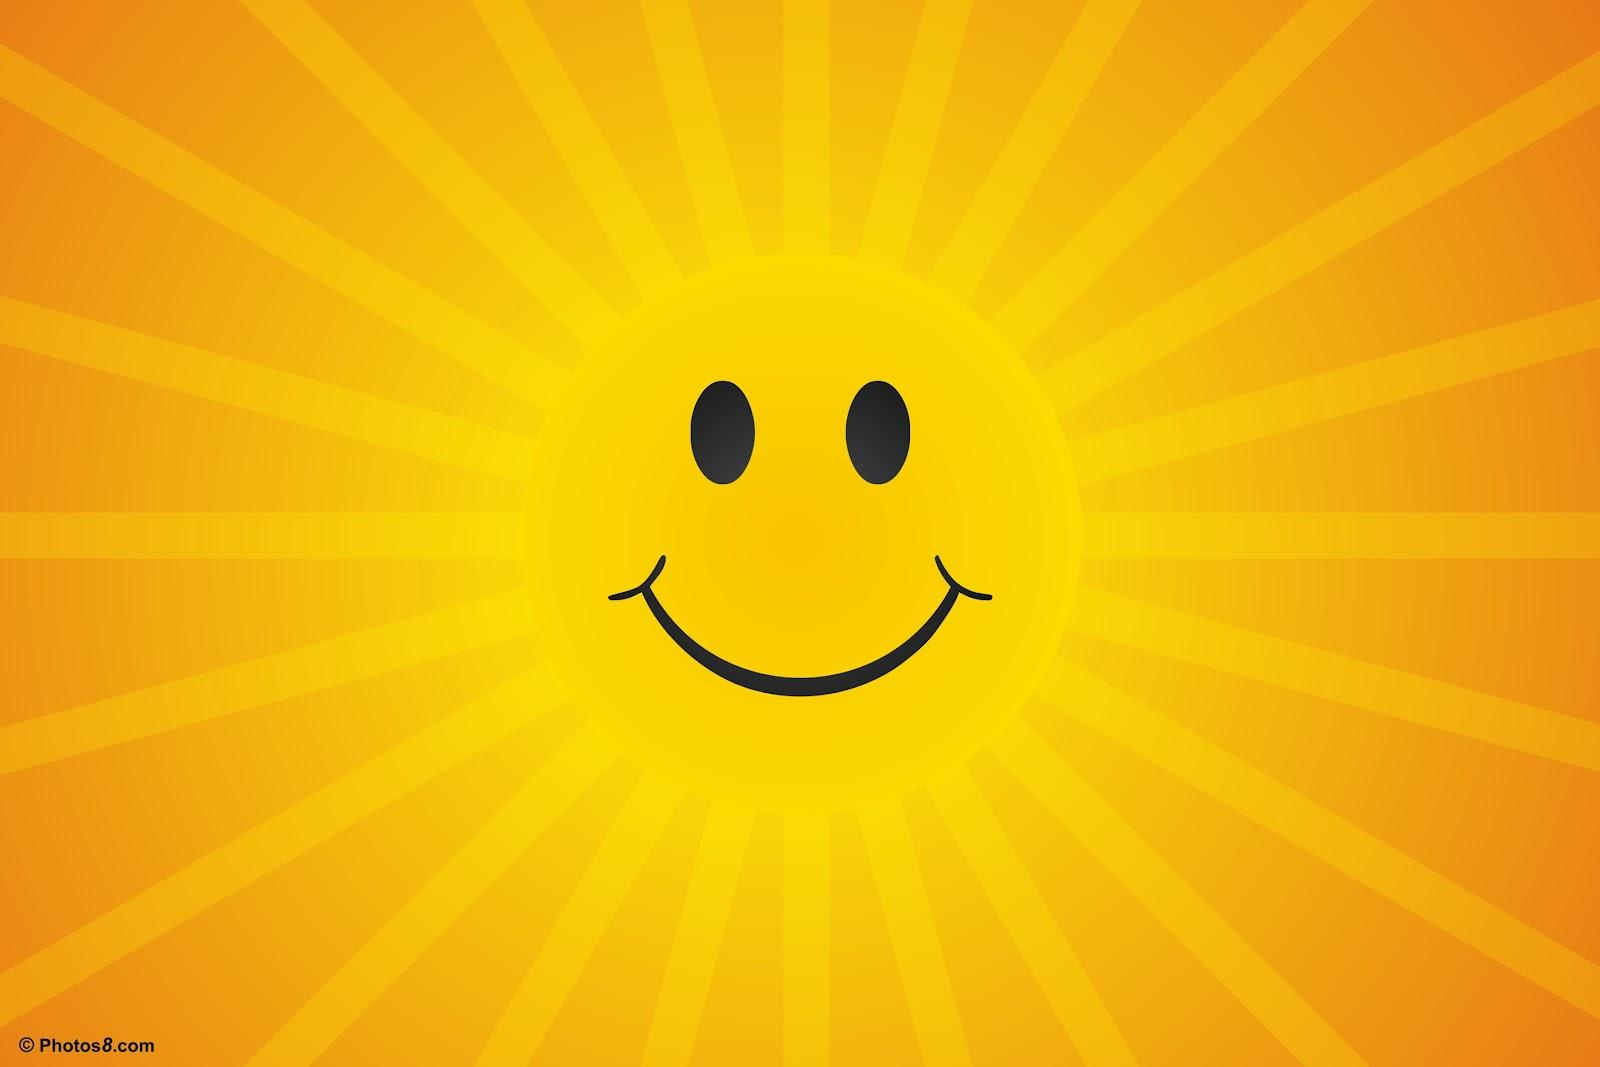 Hd Smiley Face Wallpaper: Smileys Wallpaper